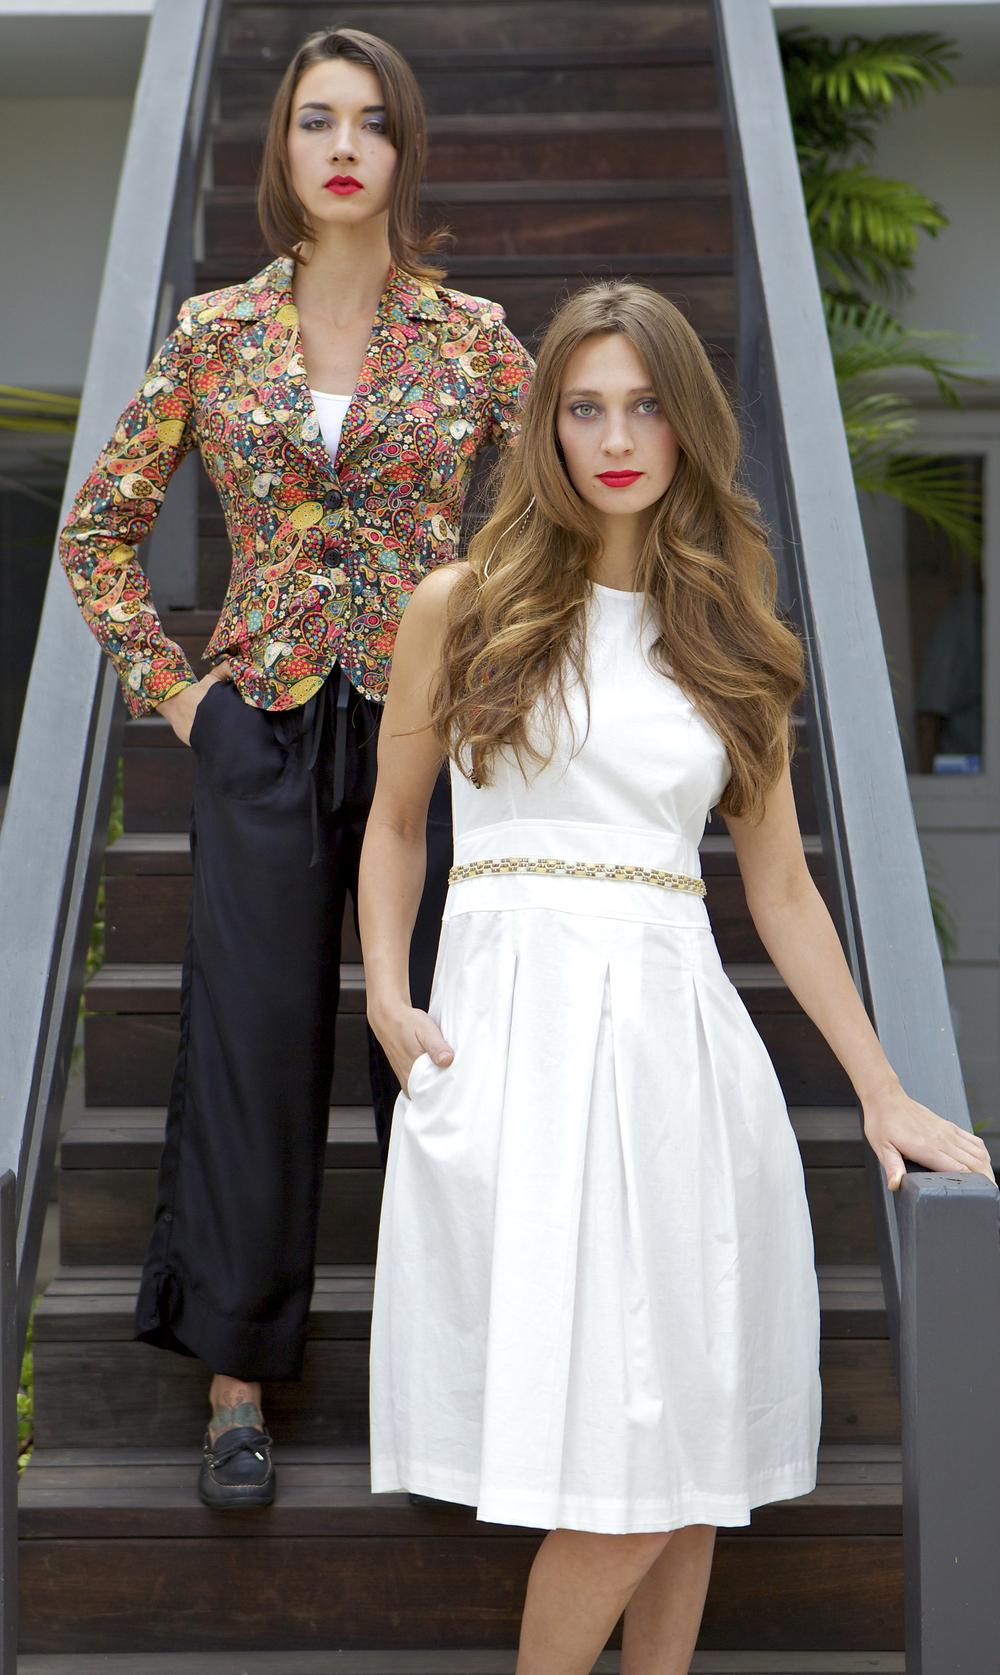 Liberty Blazer and White Cotton Dress with Beading